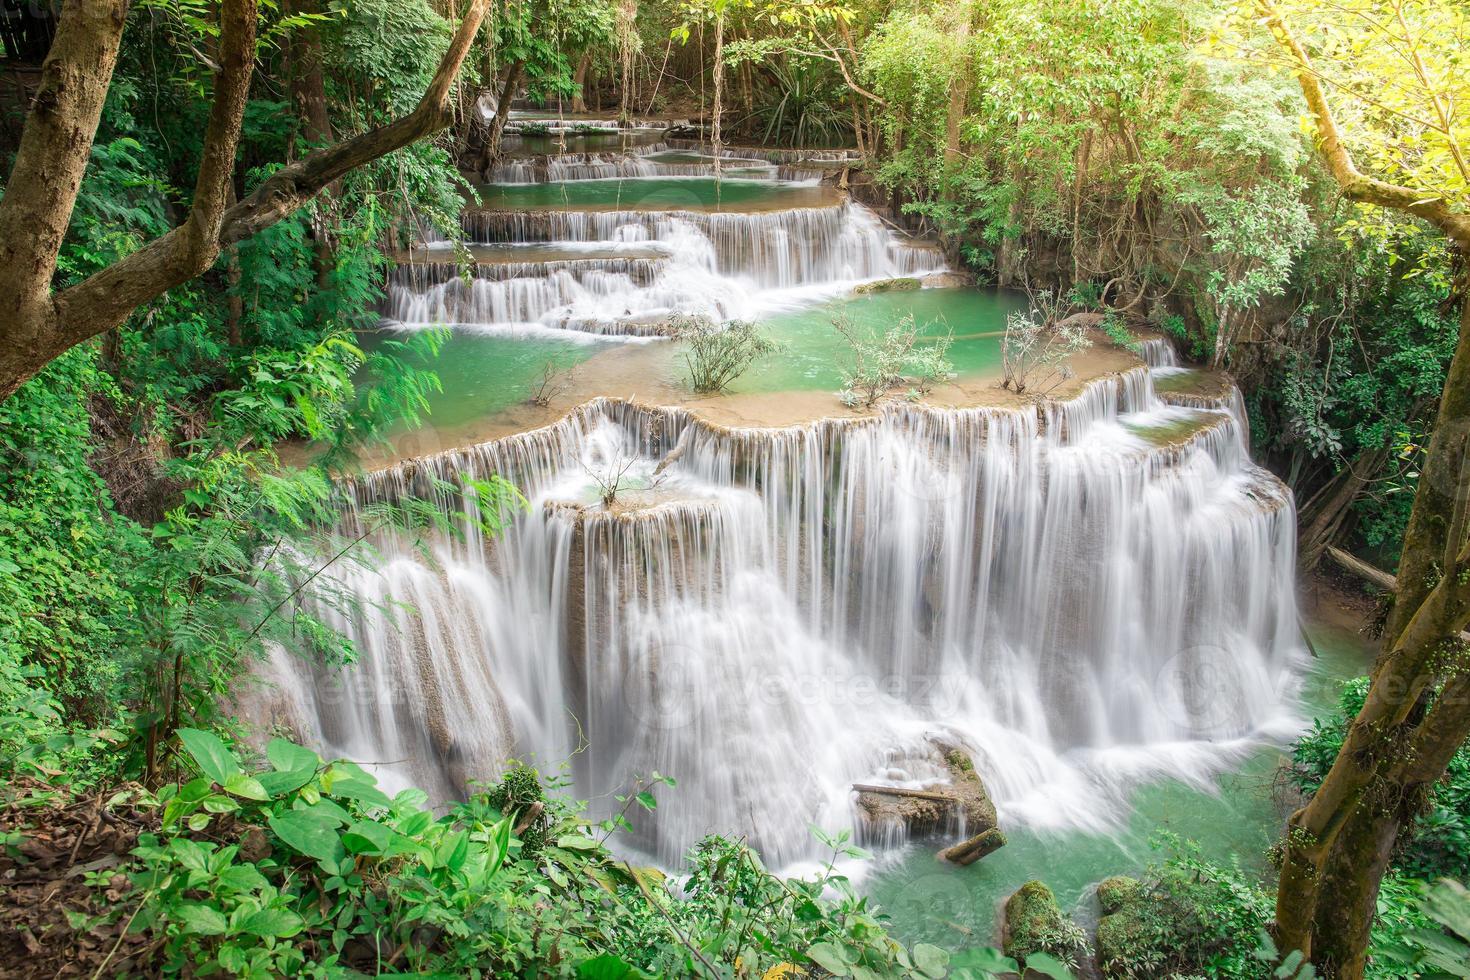 Cascade de Thaïlande à kanchanaburi (huay mae kamin) photo